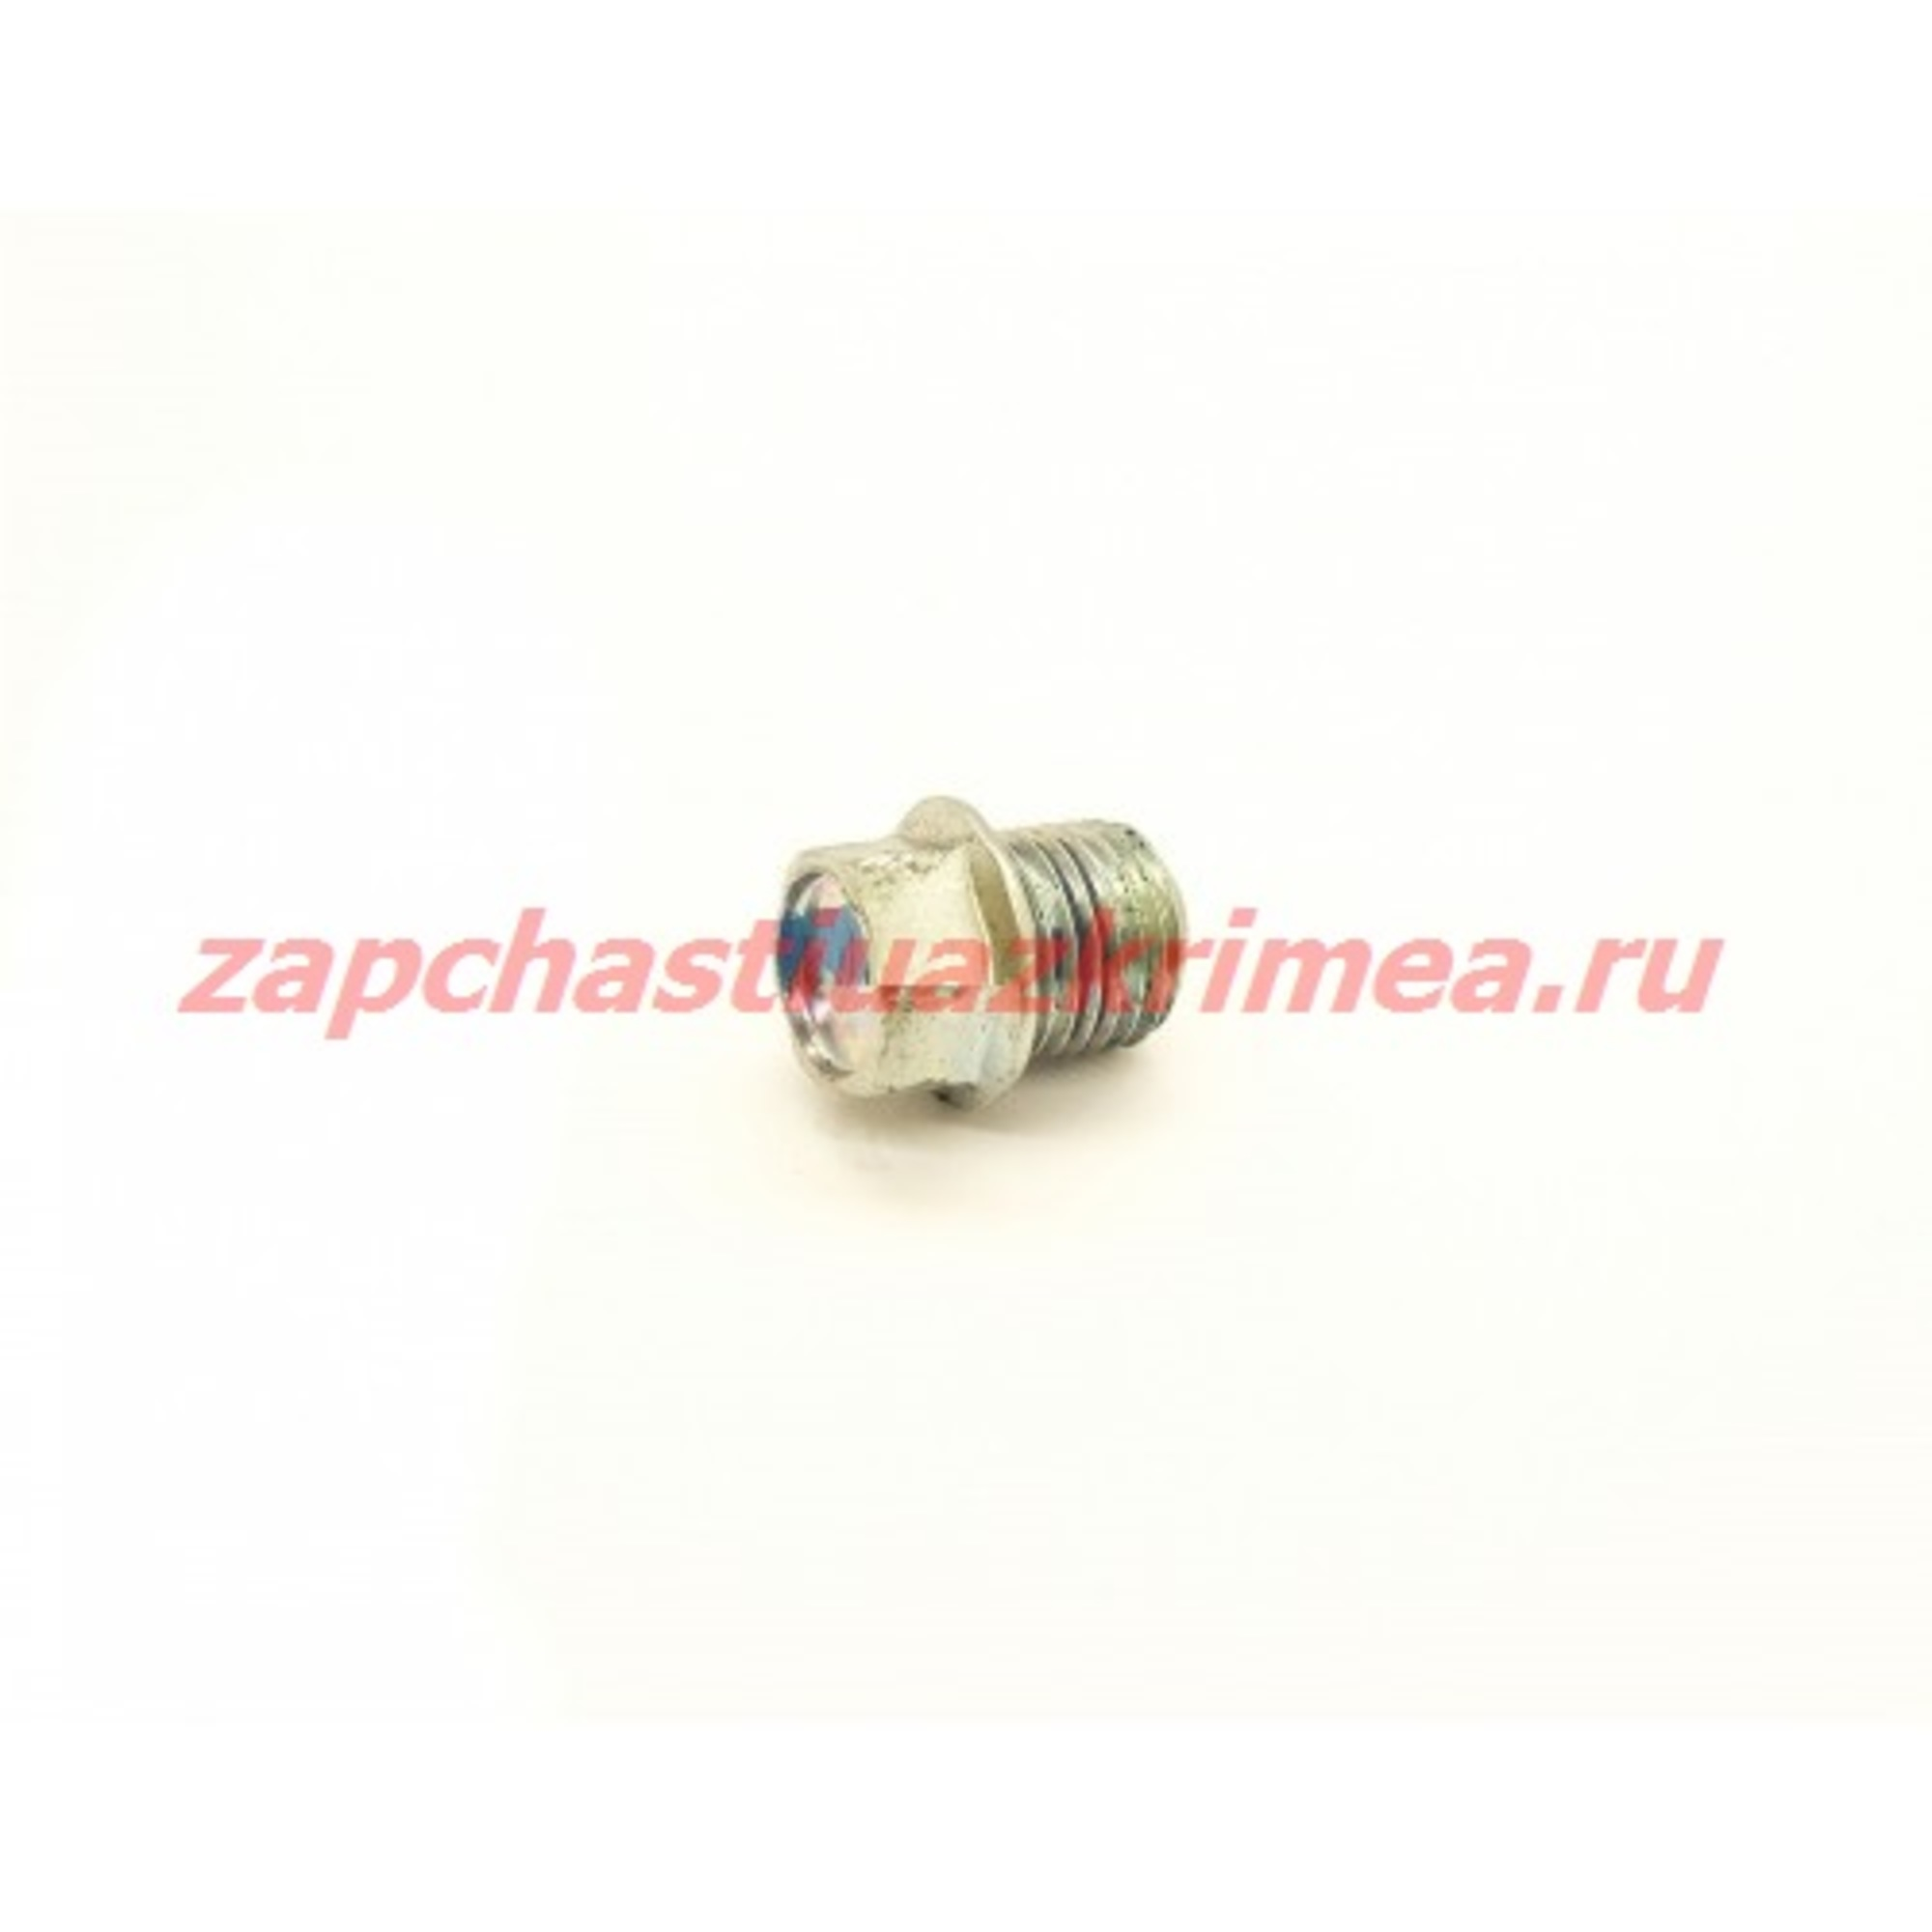 Болт М121,25 фланцевый 5-ступ КПП УАЗ DYMOS 43455Т00120